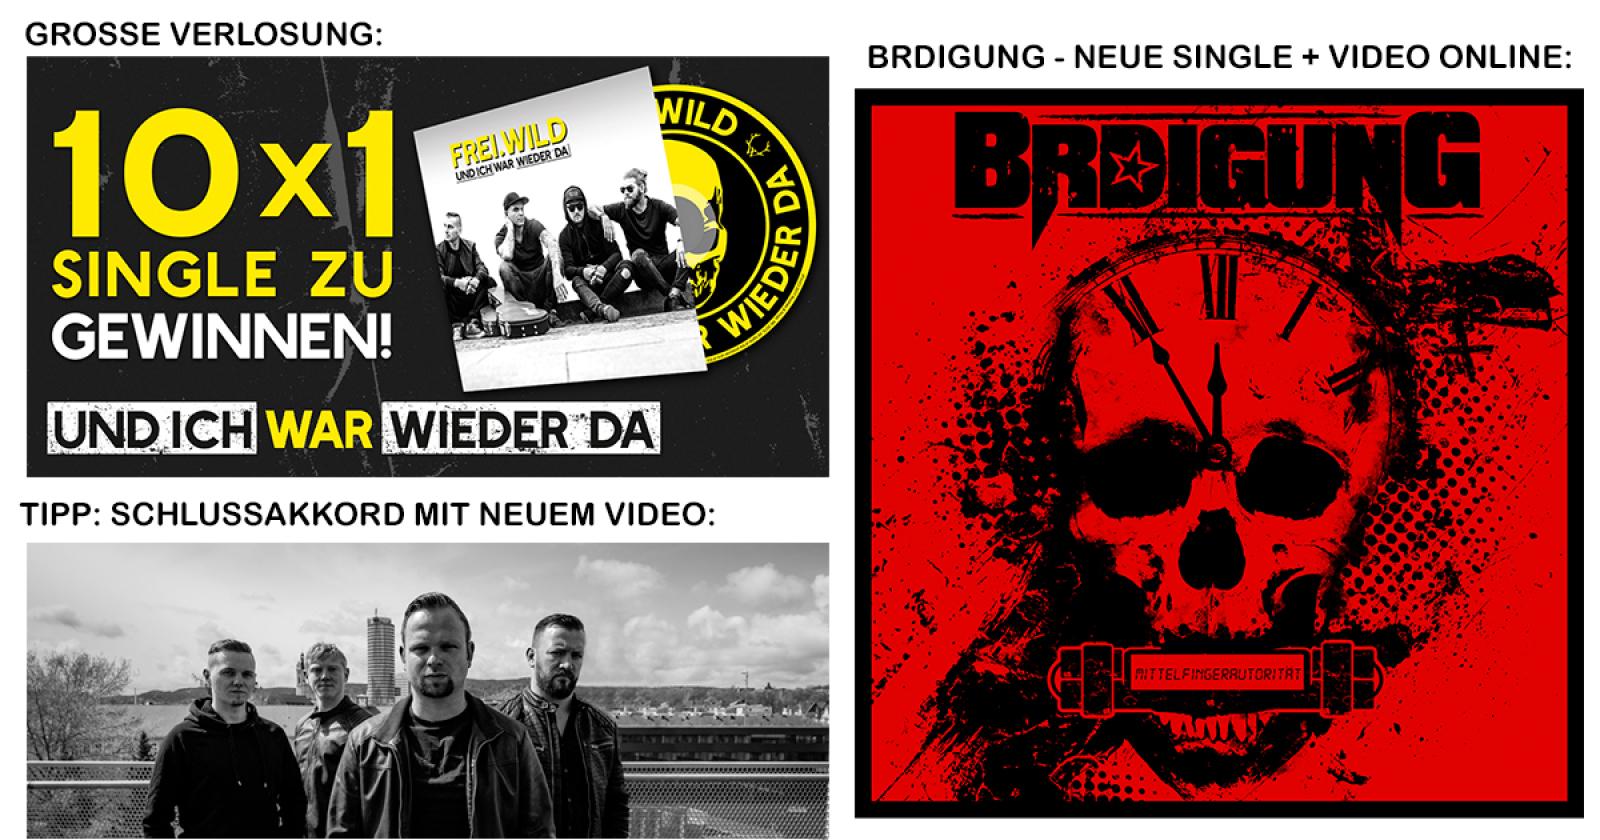 Newsletter 29012018 Brdigung 3single Video